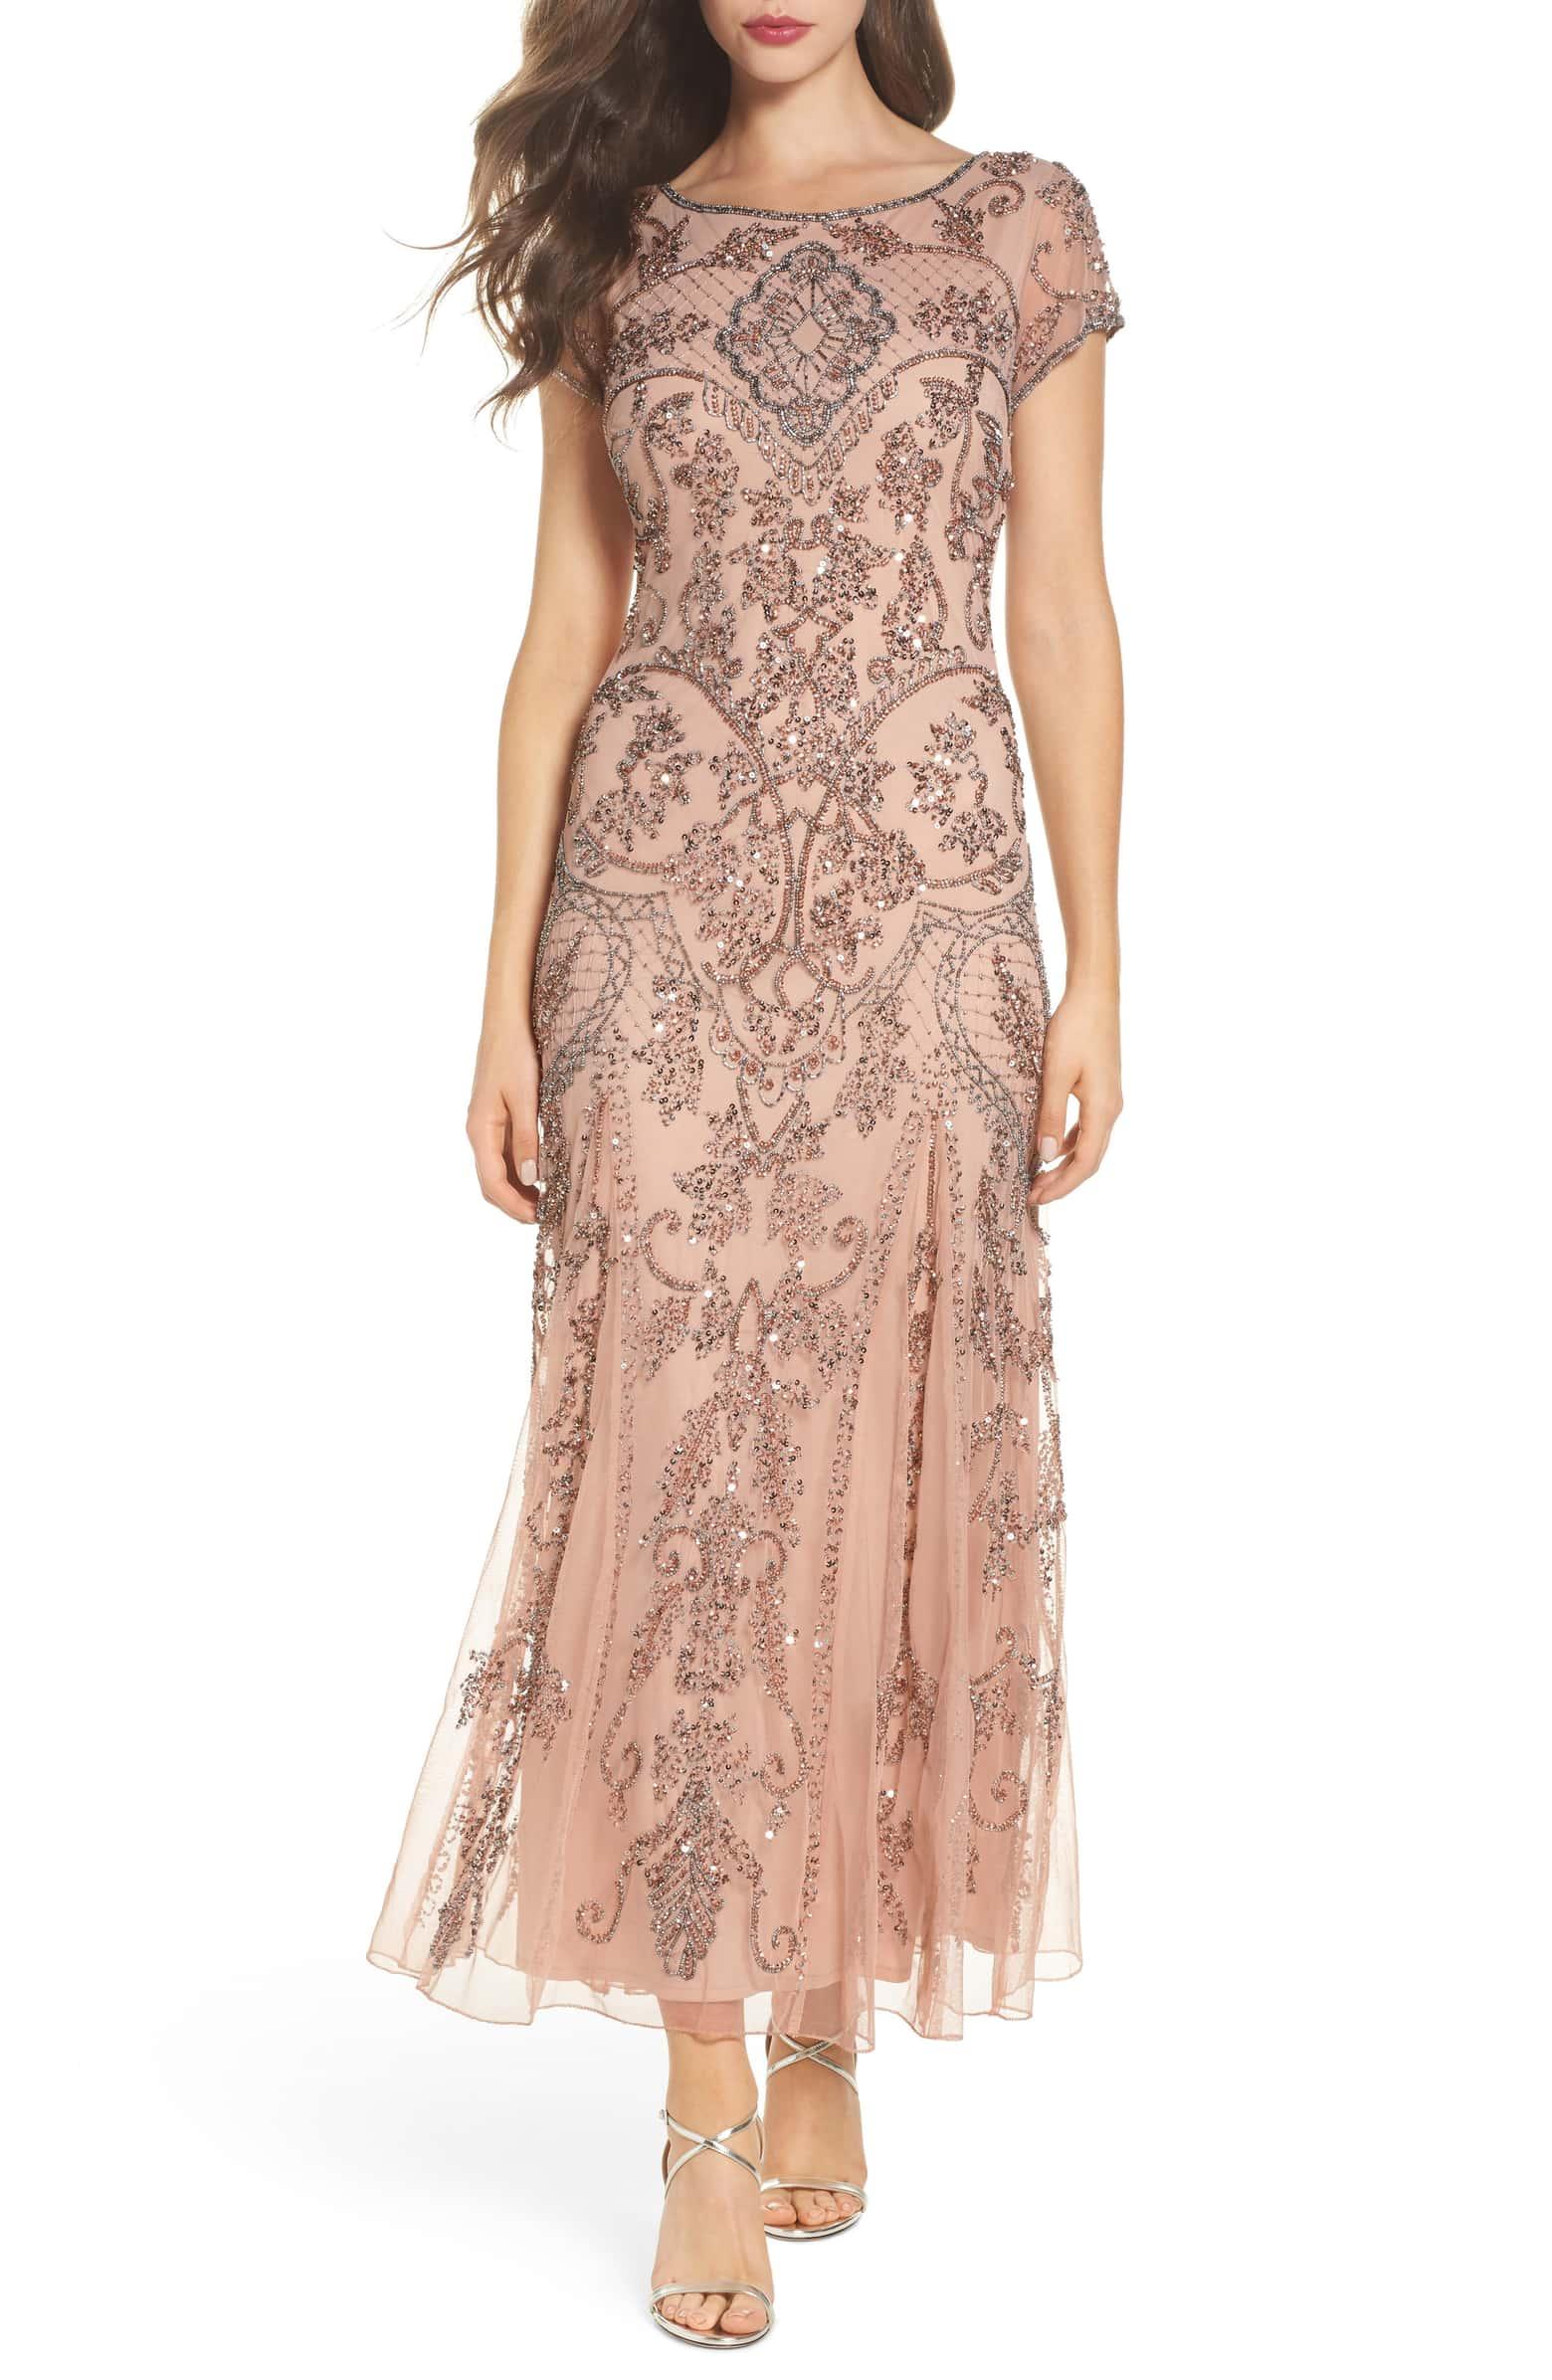 blush mesh gown.jpg